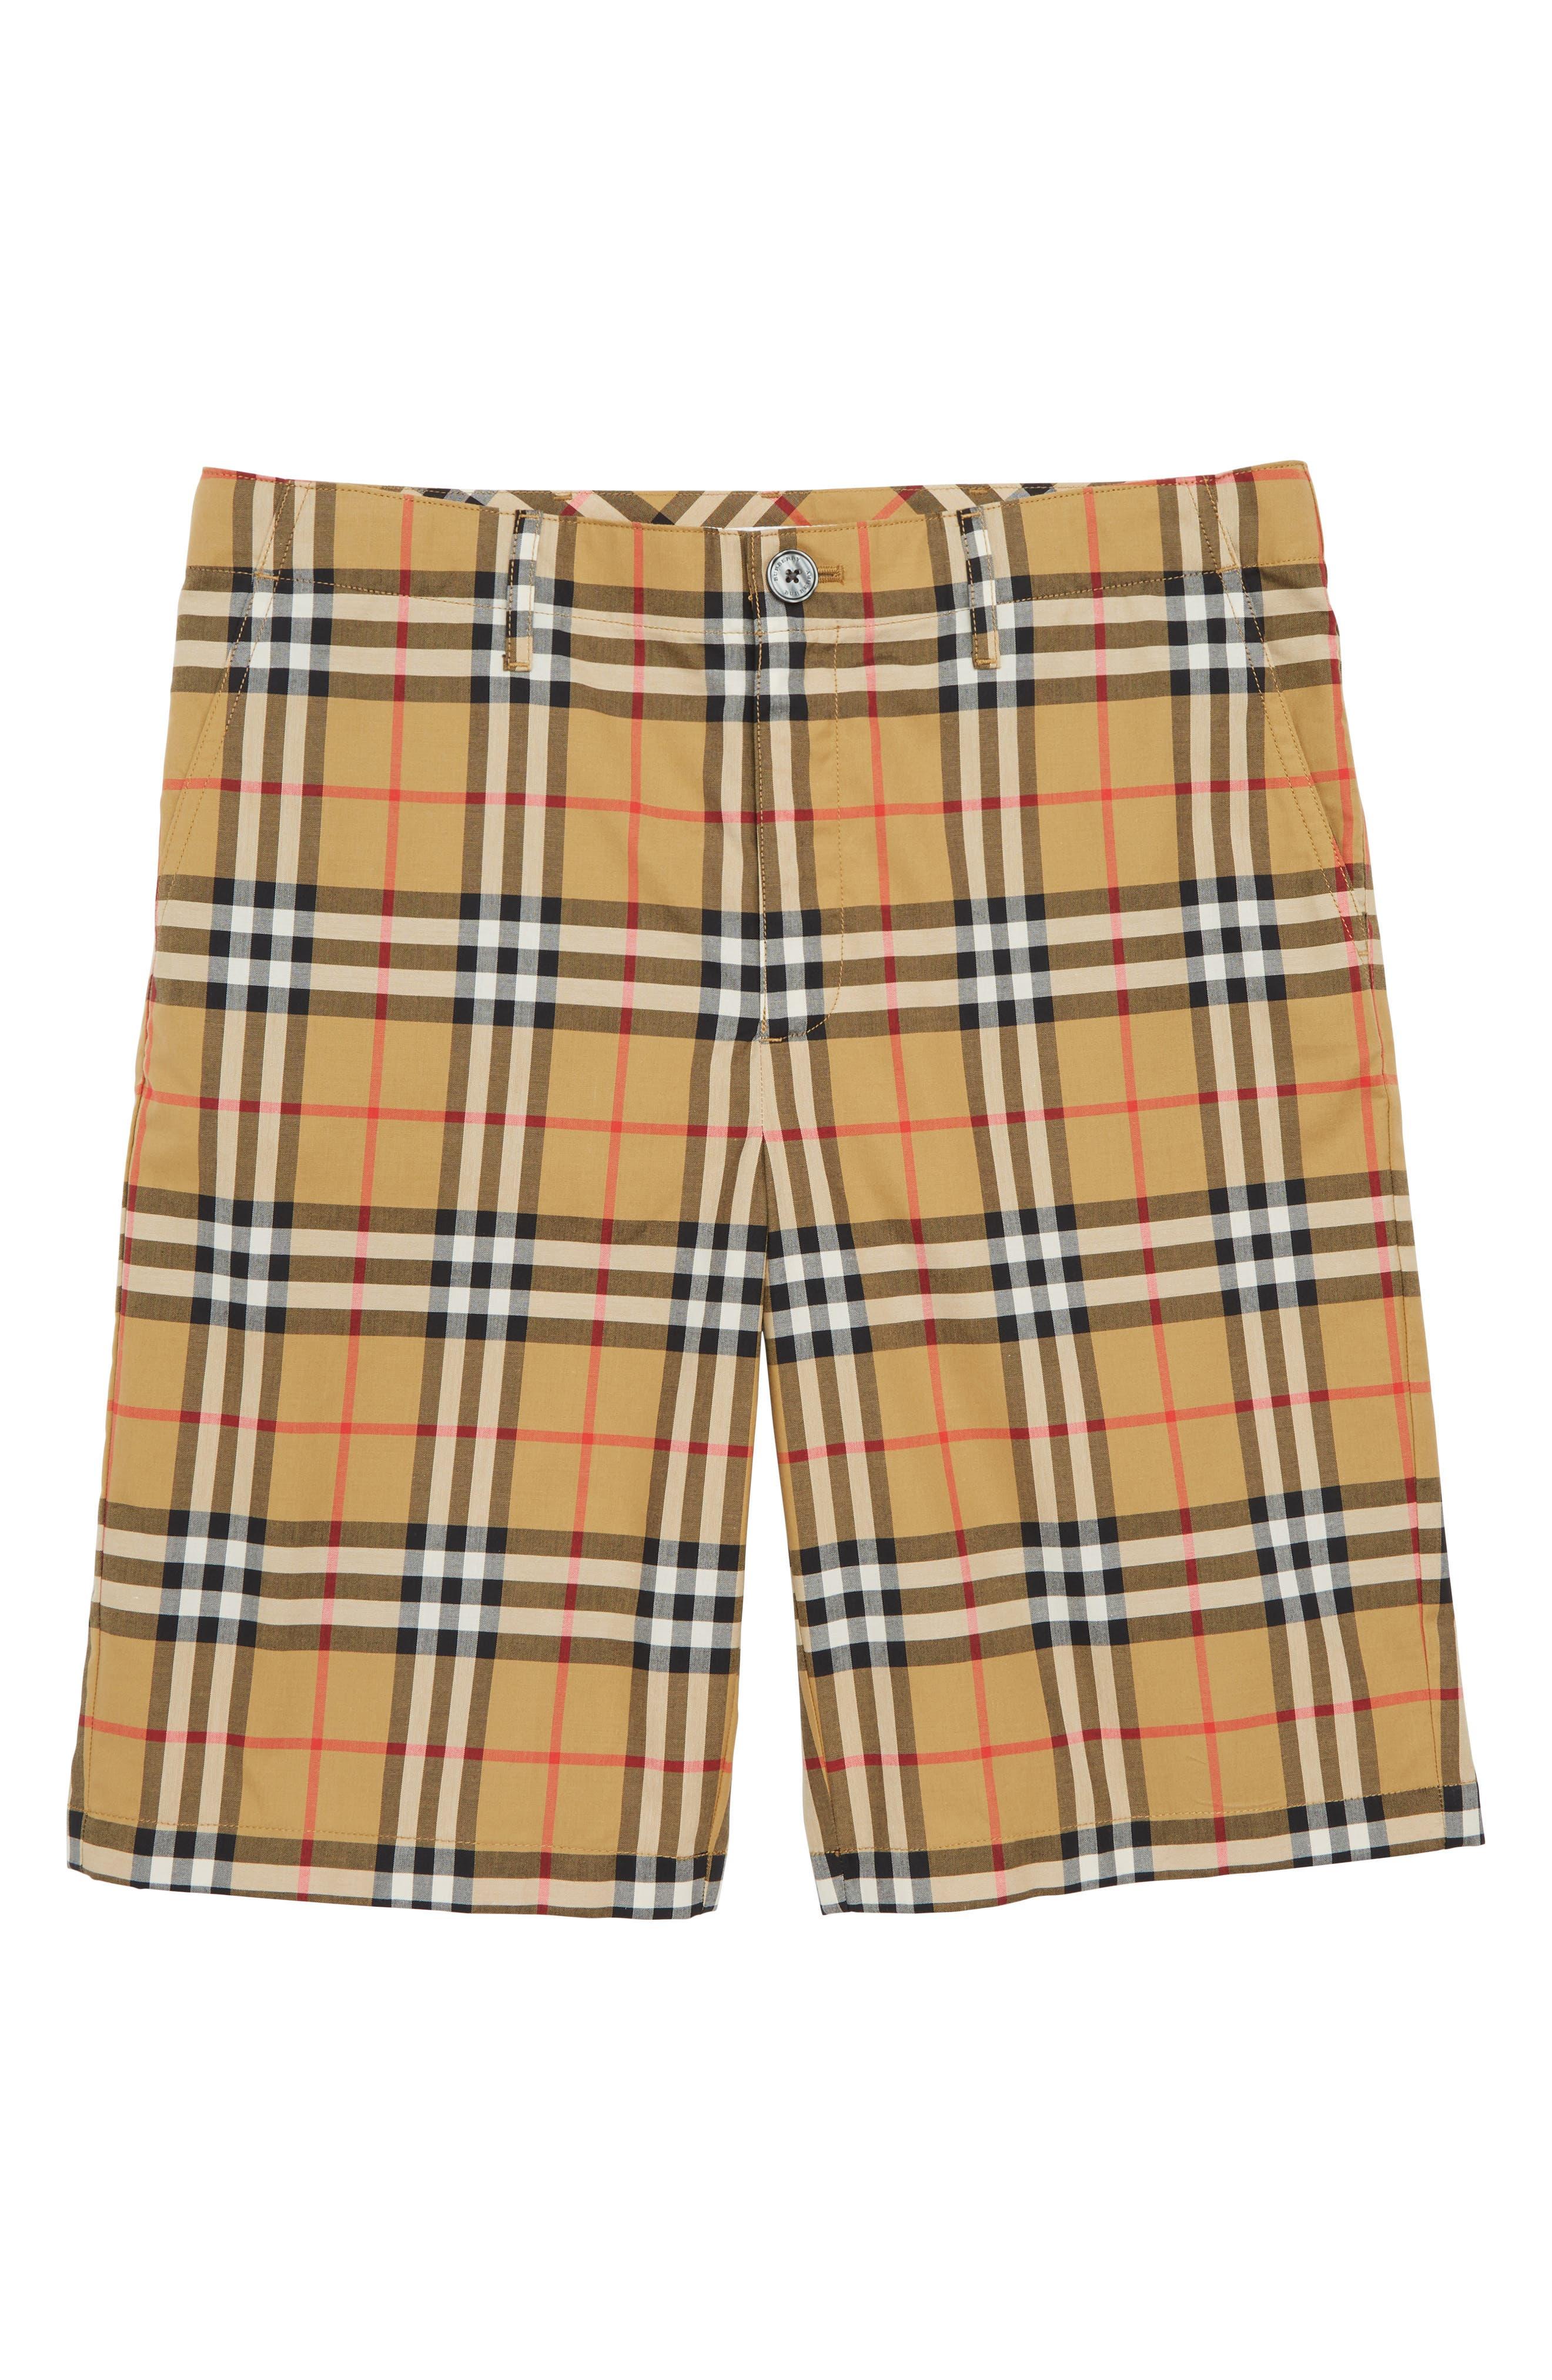 Tristen Check Shorts,                             Main thumbnail 1, color,                             ANTIQUE YELLOW